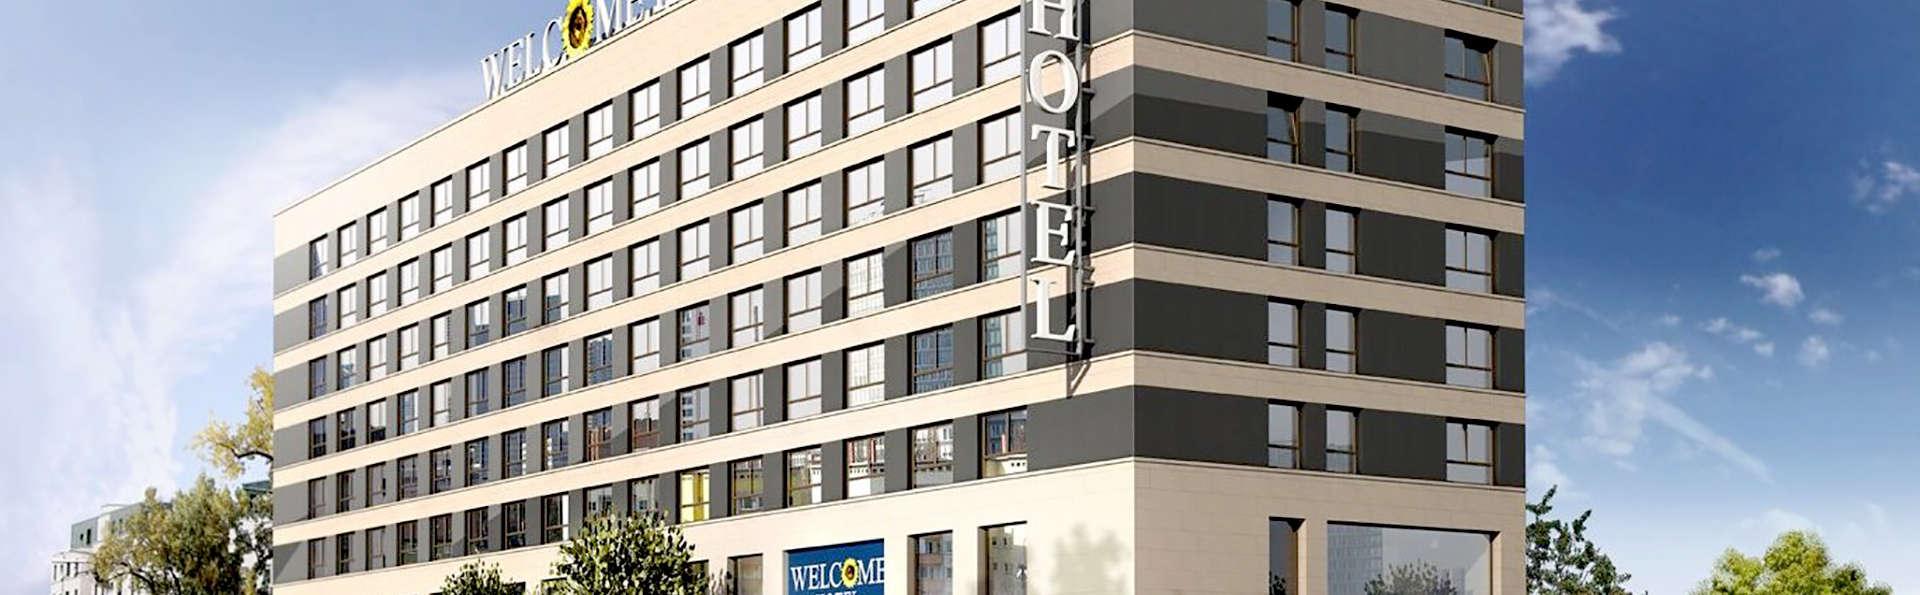 Welcome Hotel Frankfurt - Edit_front2.jpg